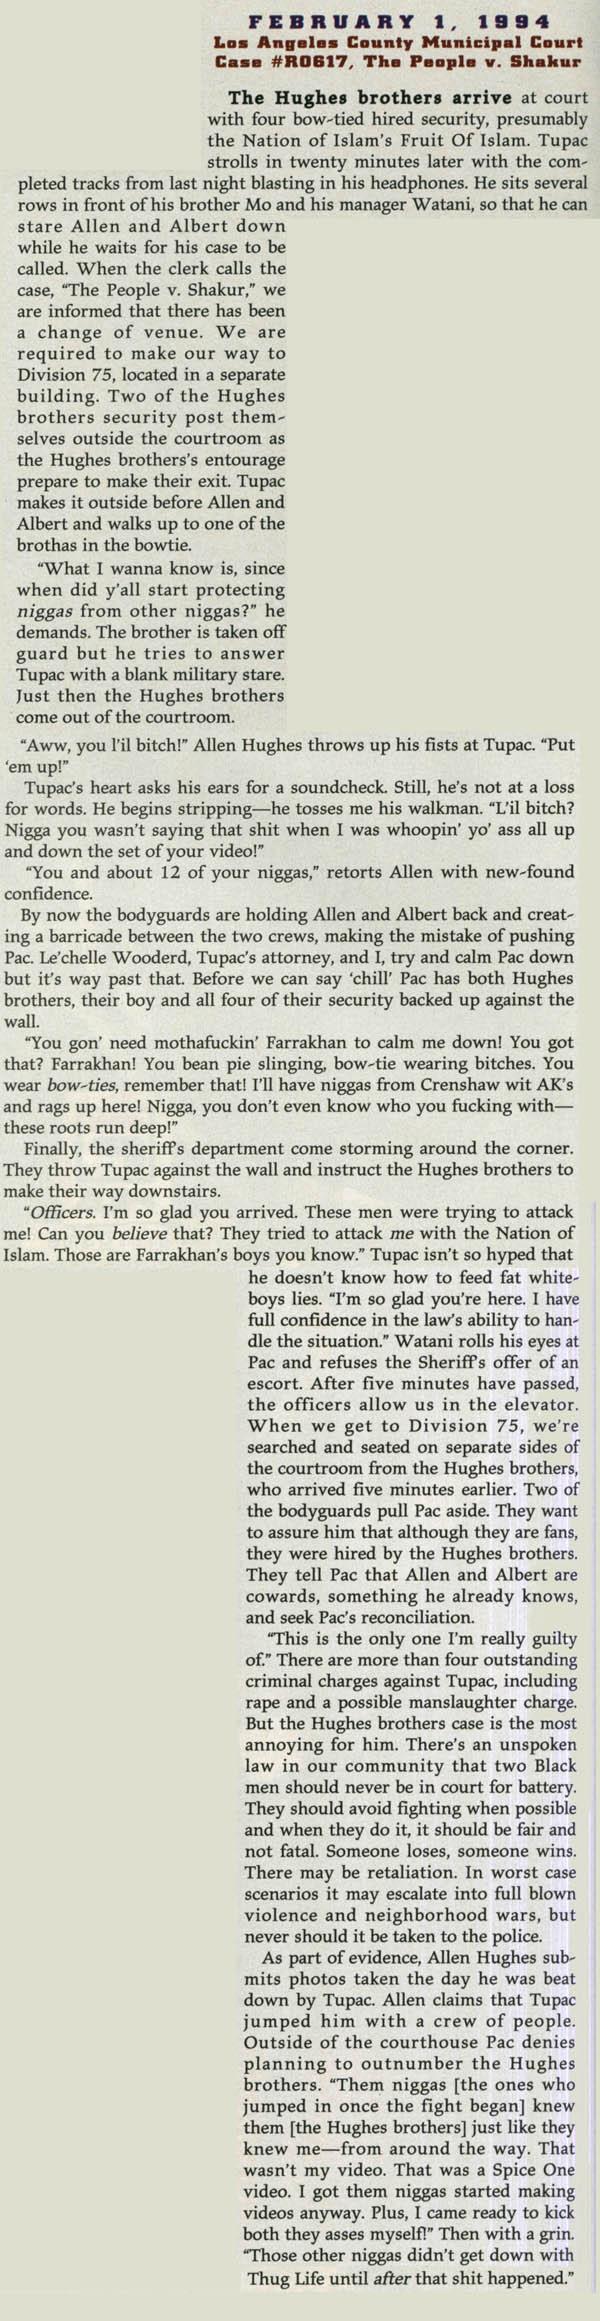 Tupac: Hellraiser (The Source, February 01, 1994)